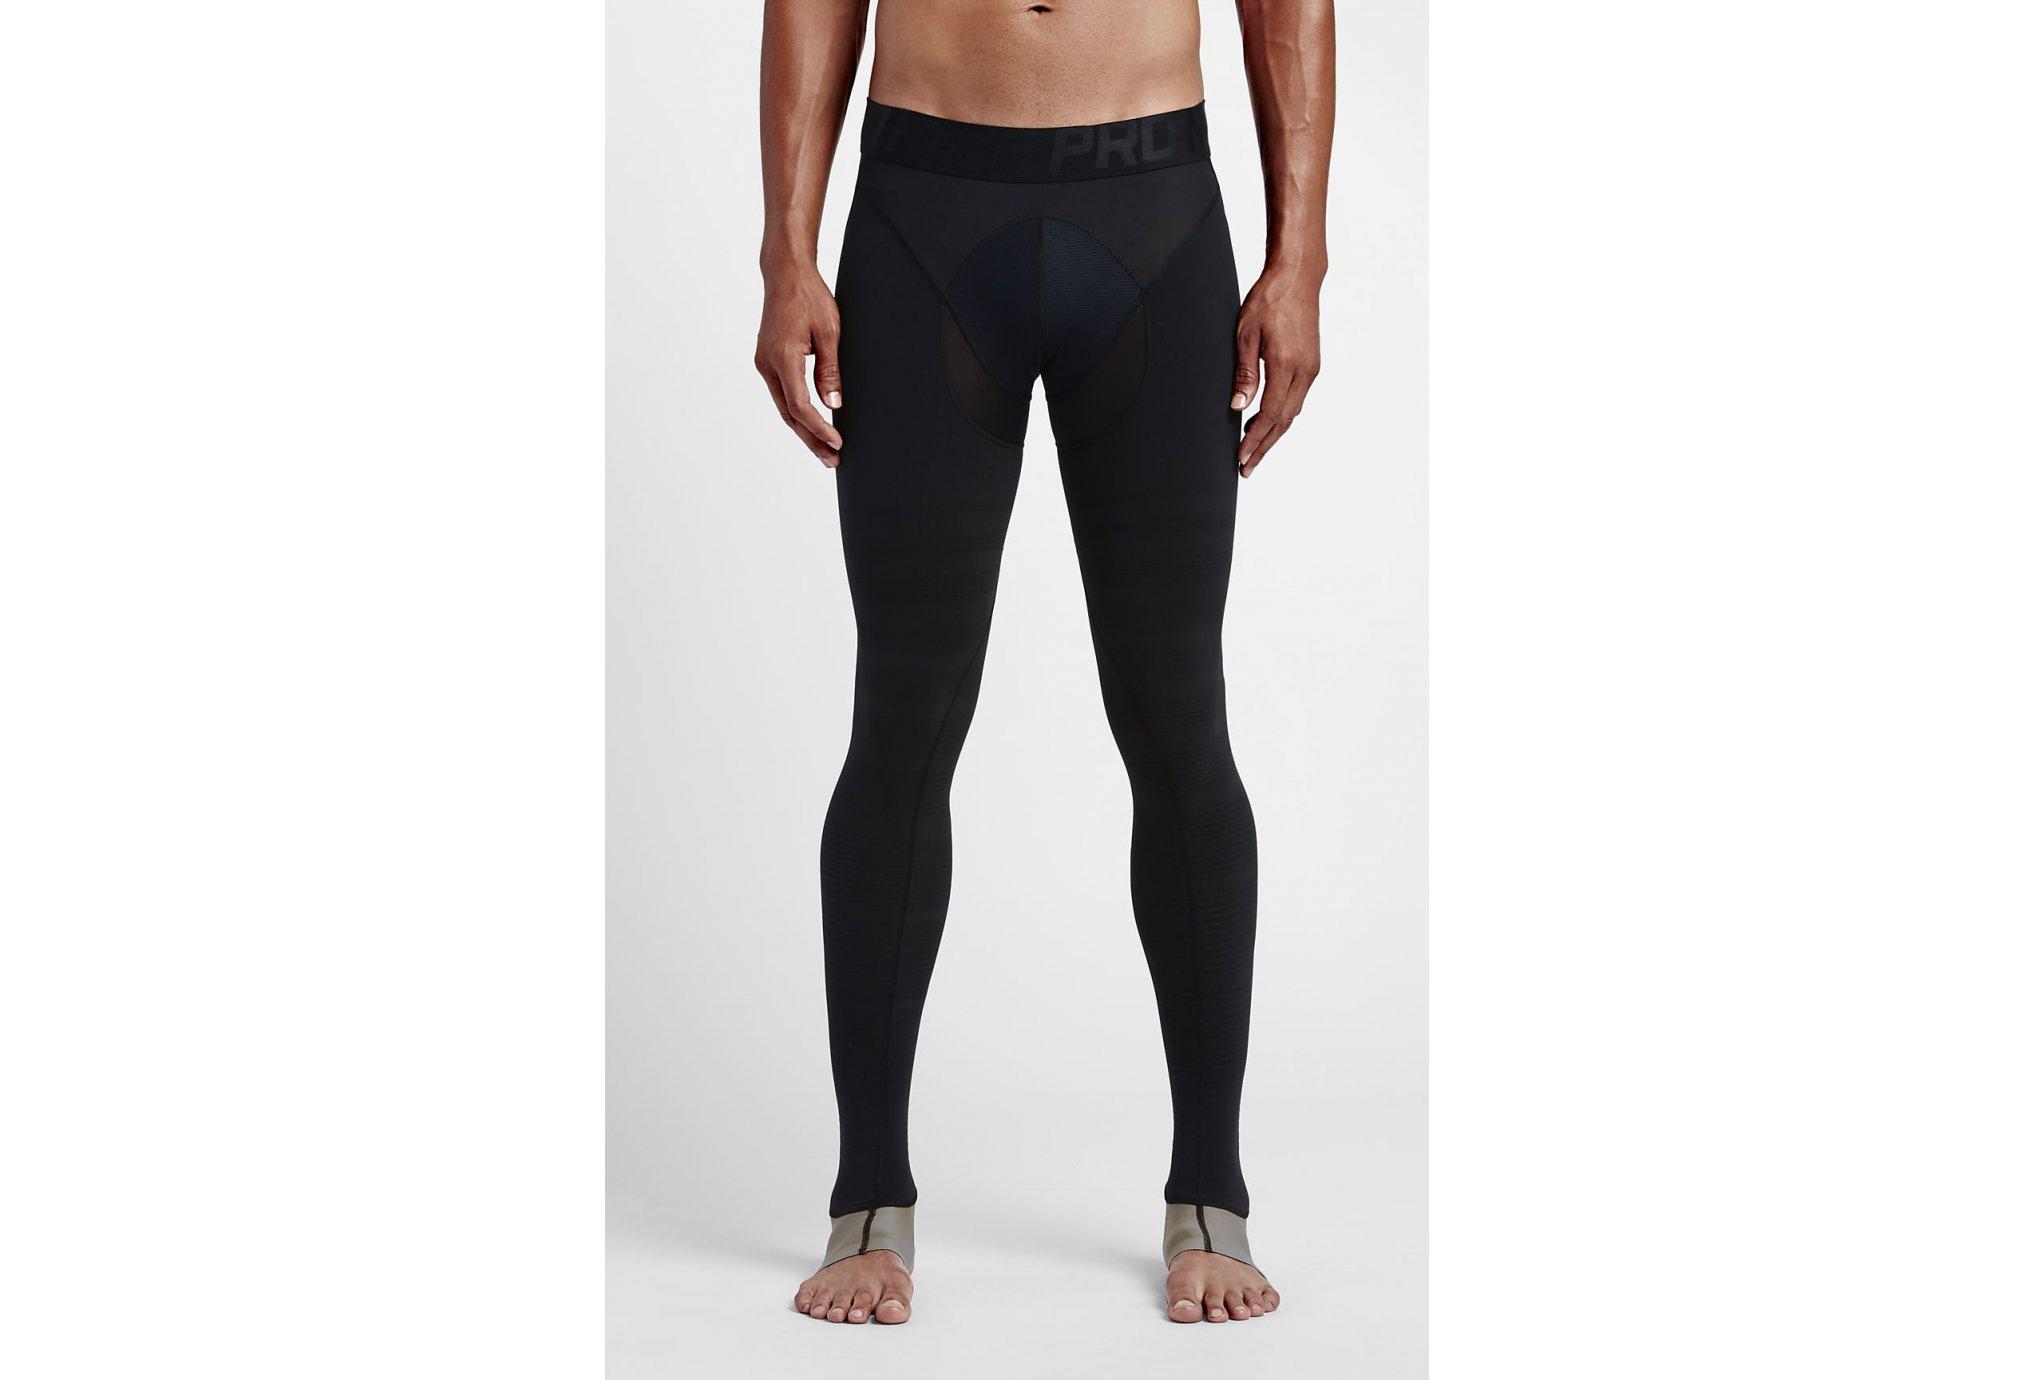 Nike Pro Hyperrecovery Tight M Diététique Vêtements homme